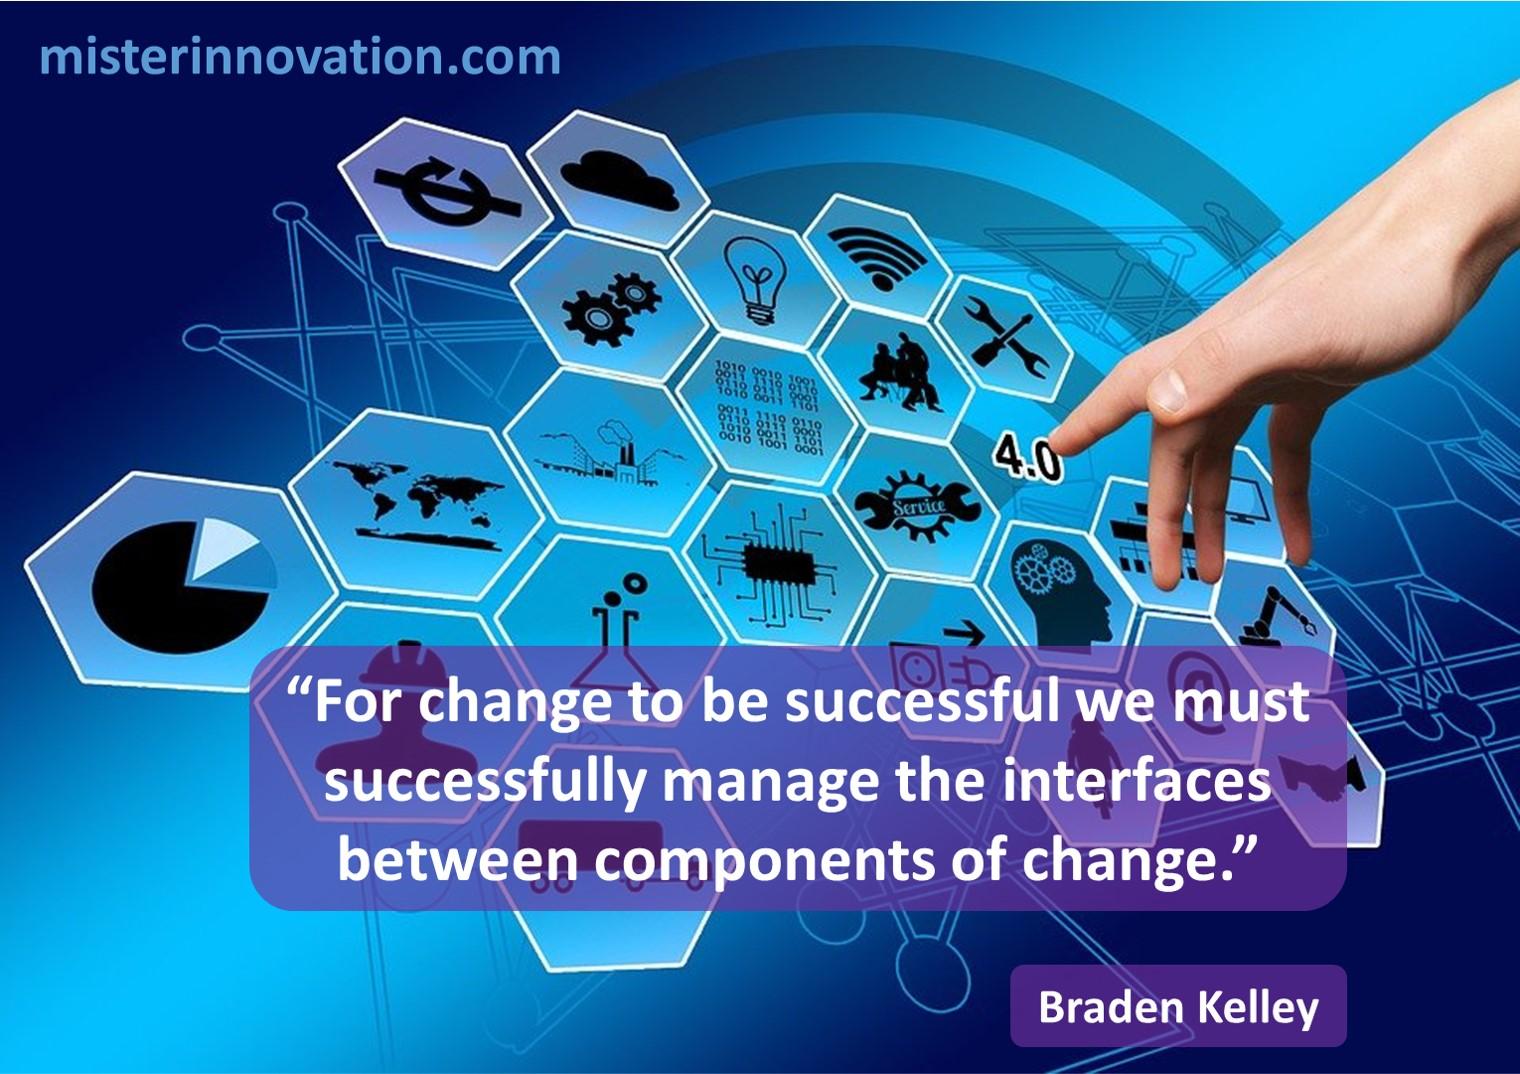 Change Interfaces